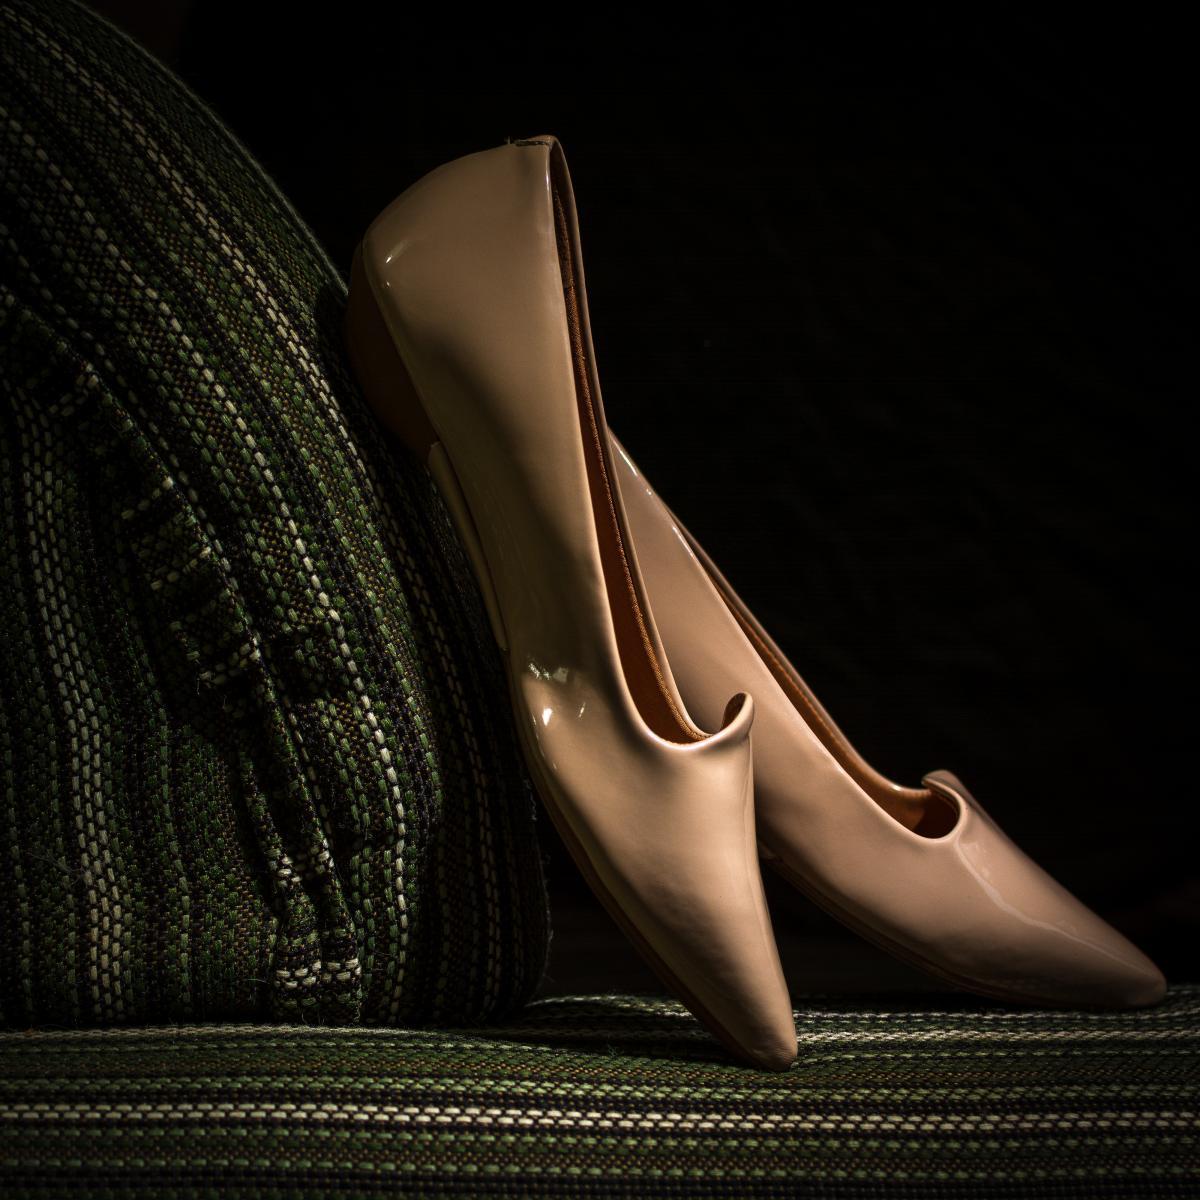 Feet female sets shoes